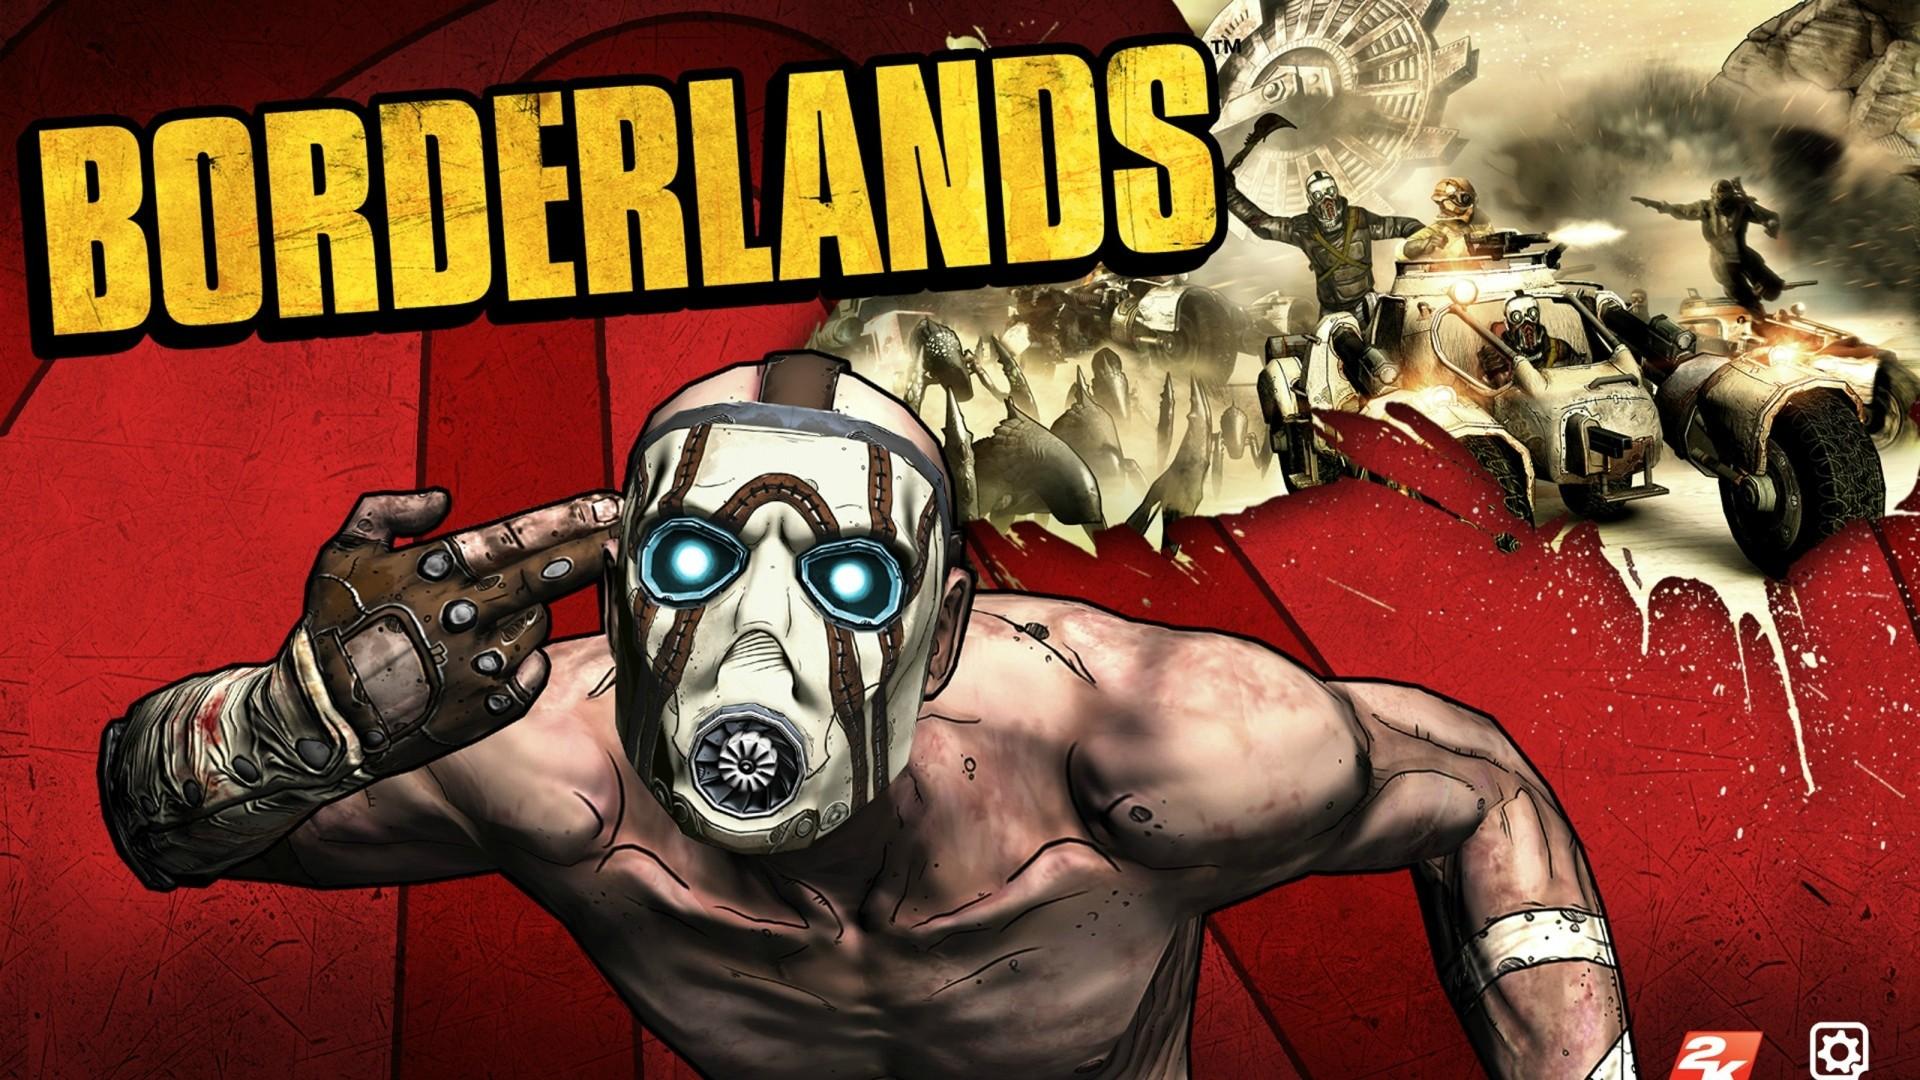 Video Game Borderlands Wallpaper Details and Download Free